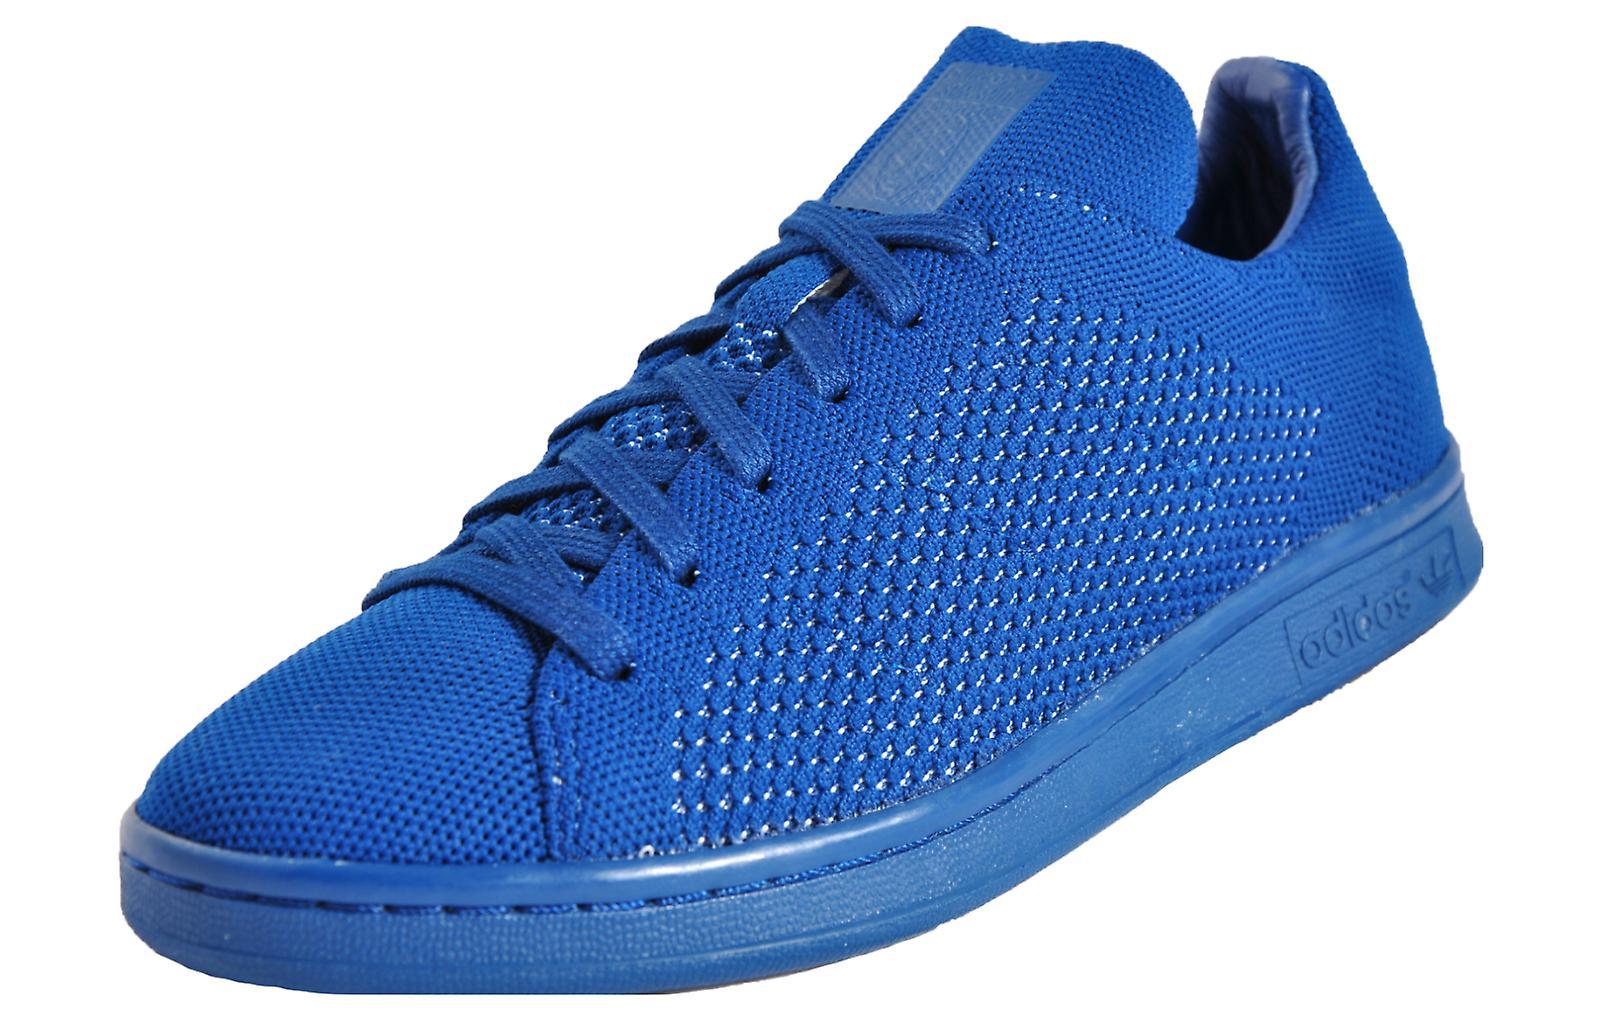 Adidas Stan Smith PK Primeknit Blue